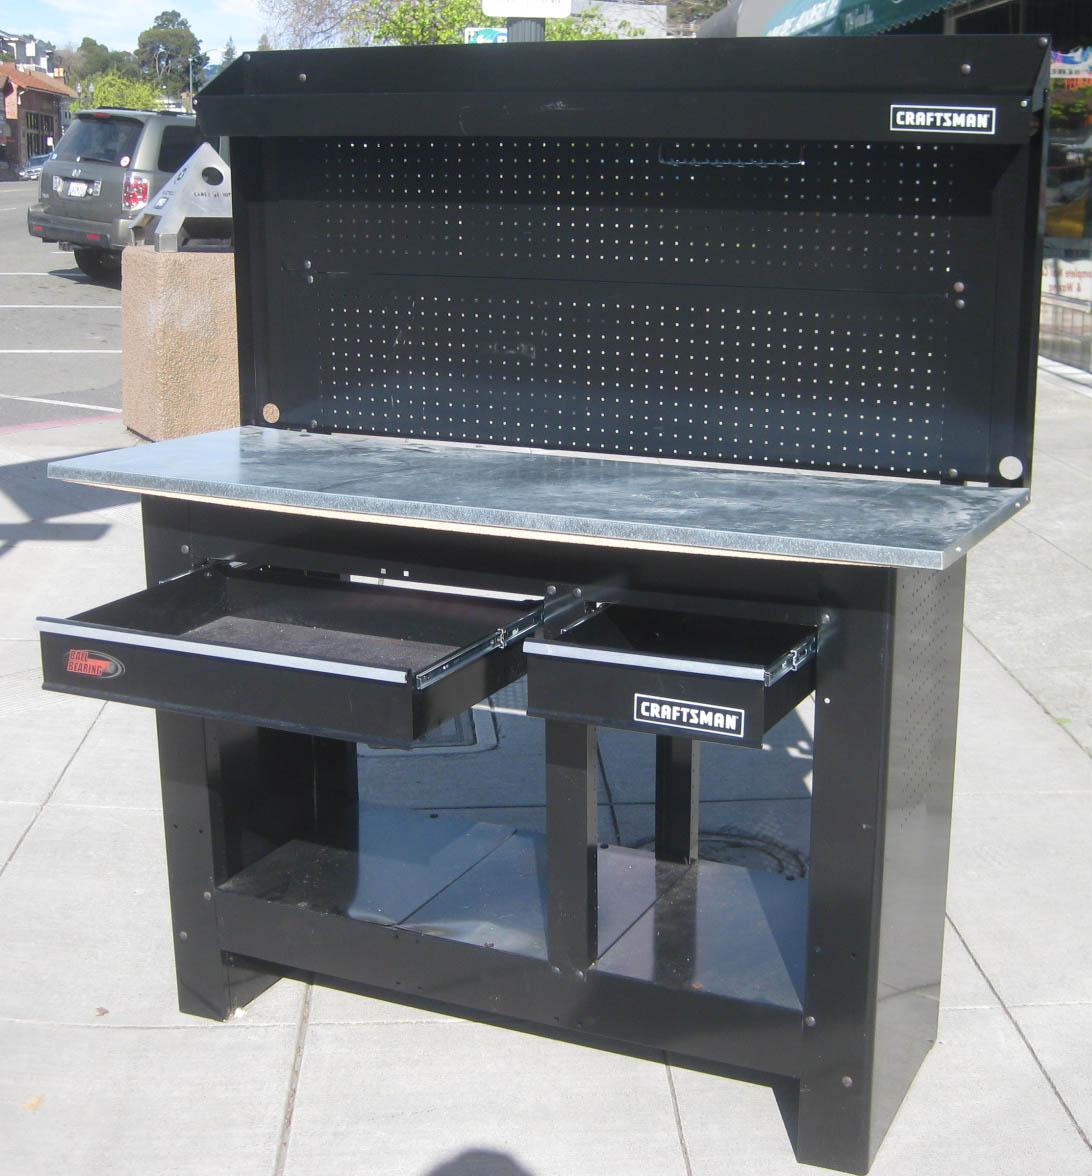 UHURU FURNITURE & COLLECTIBLES: SOLD - Craftsman Workbench ...